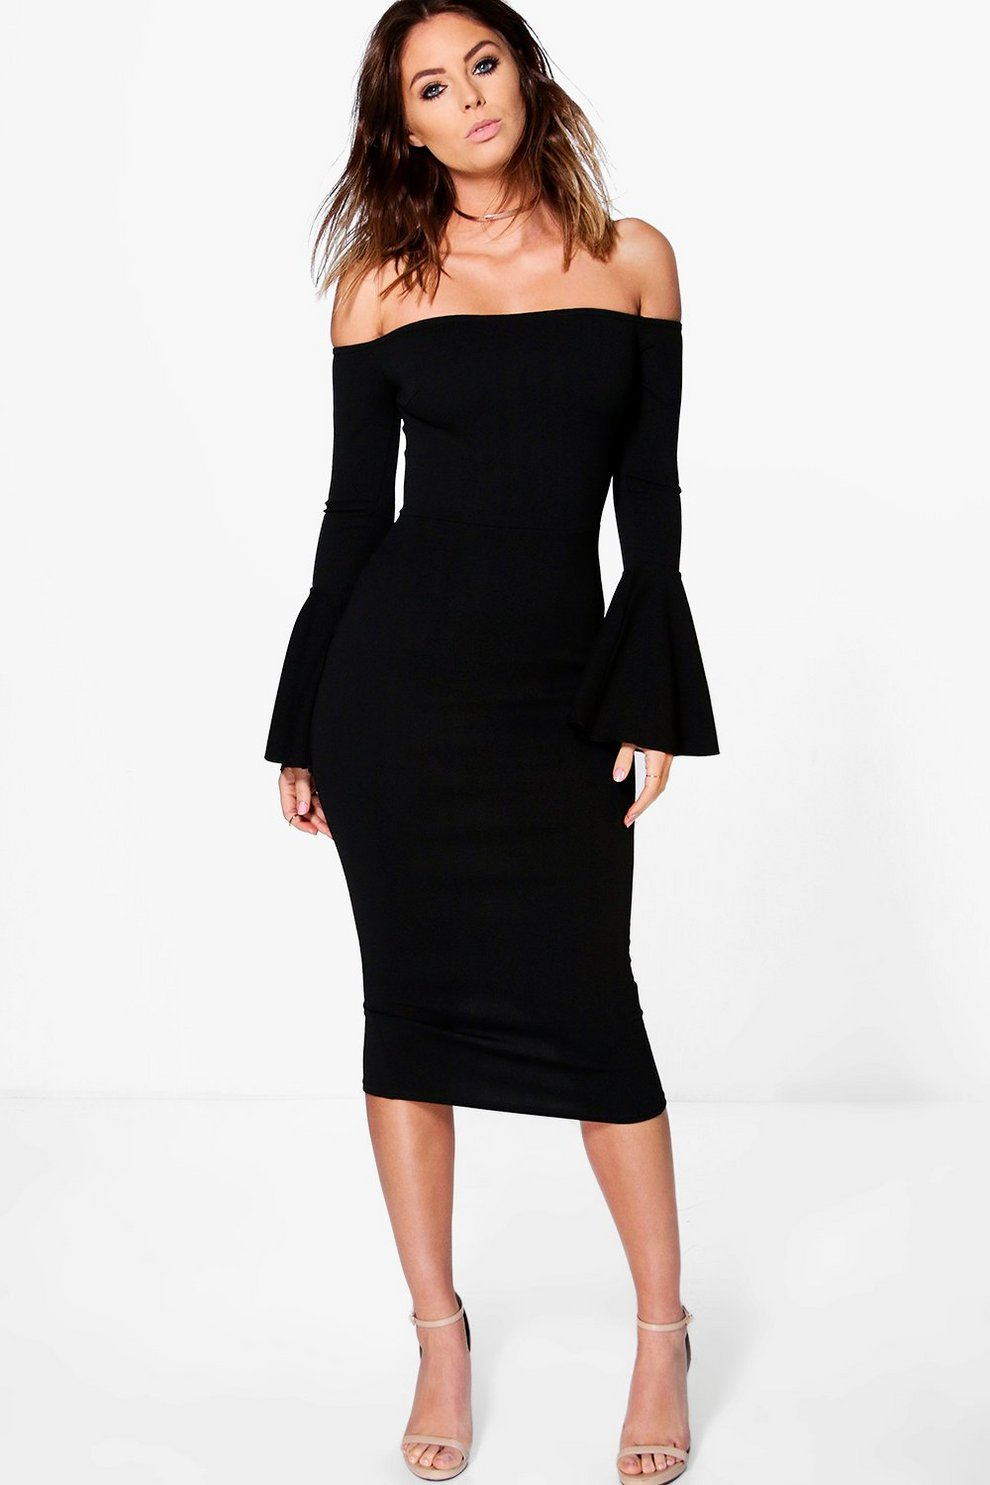 aa8bef4e42f Lana Off Shoulder Flared Sleeved Midi Dress